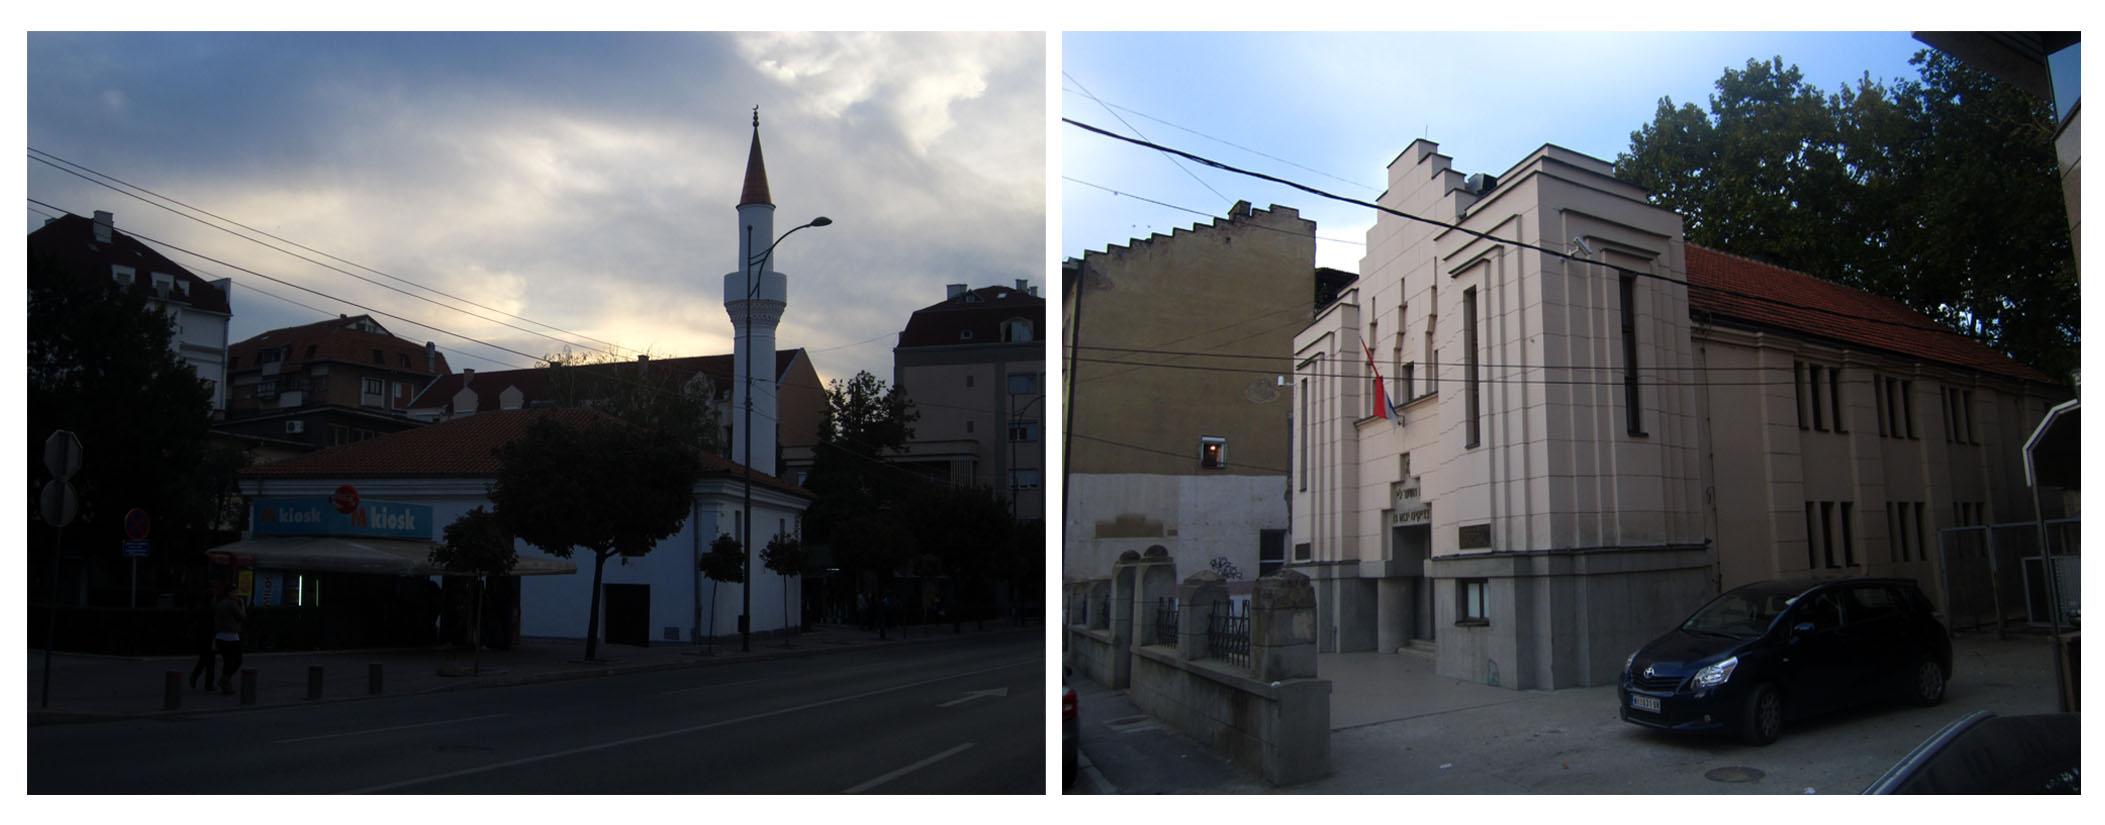 15 grad Nis dzamija i sinagoga